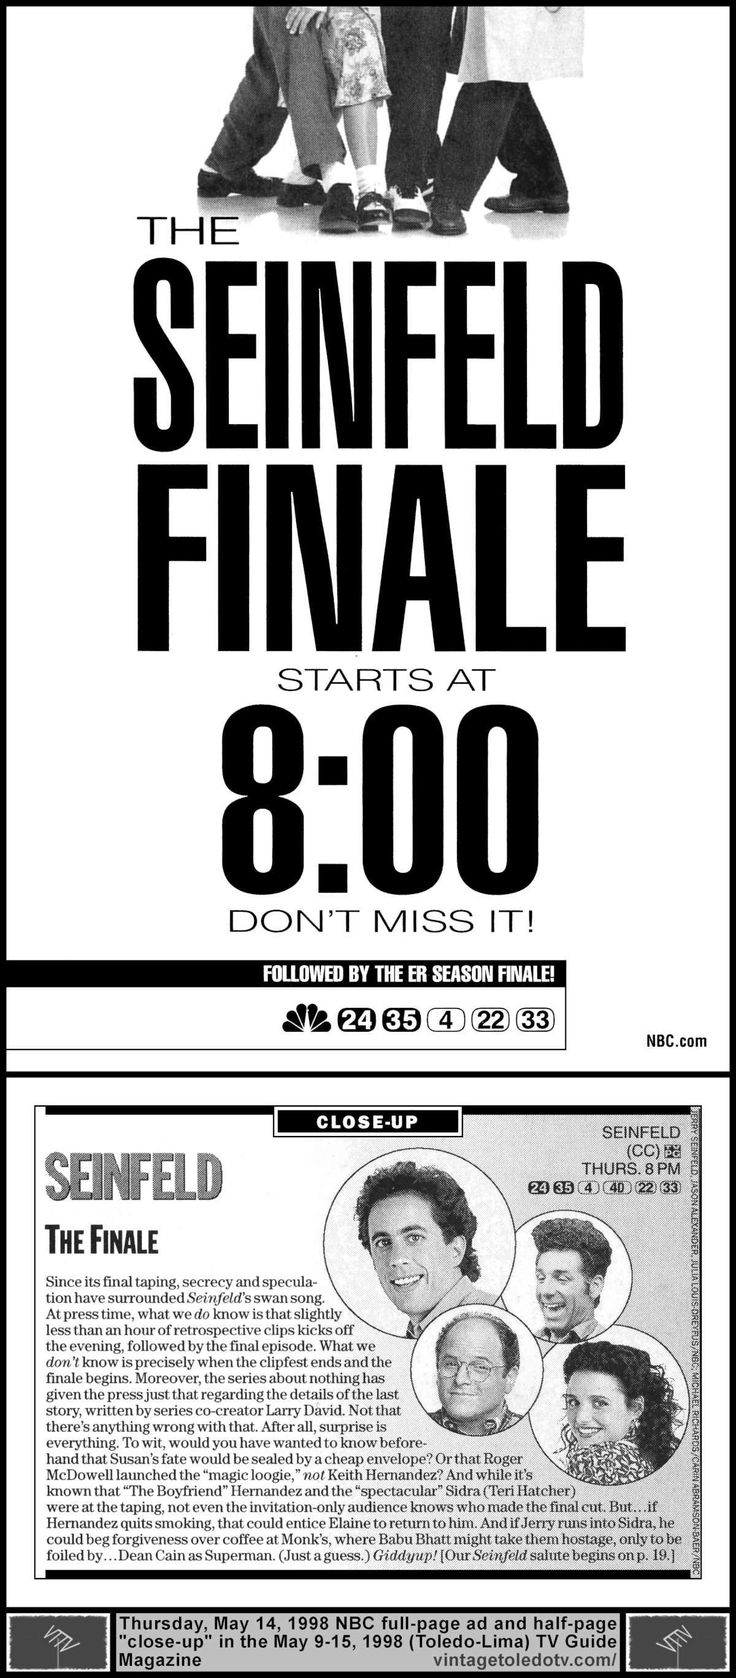 "Vintage Toledo TV - NBC Print ads - Seinfeld ""The Finale"" (Thu 5/14/98 full-pg TV Guide ad and half-pg ""close-up"") Jerry Seinfeld, Michael Richards, Jason Alexander, Julia Louis-Dreyfus."